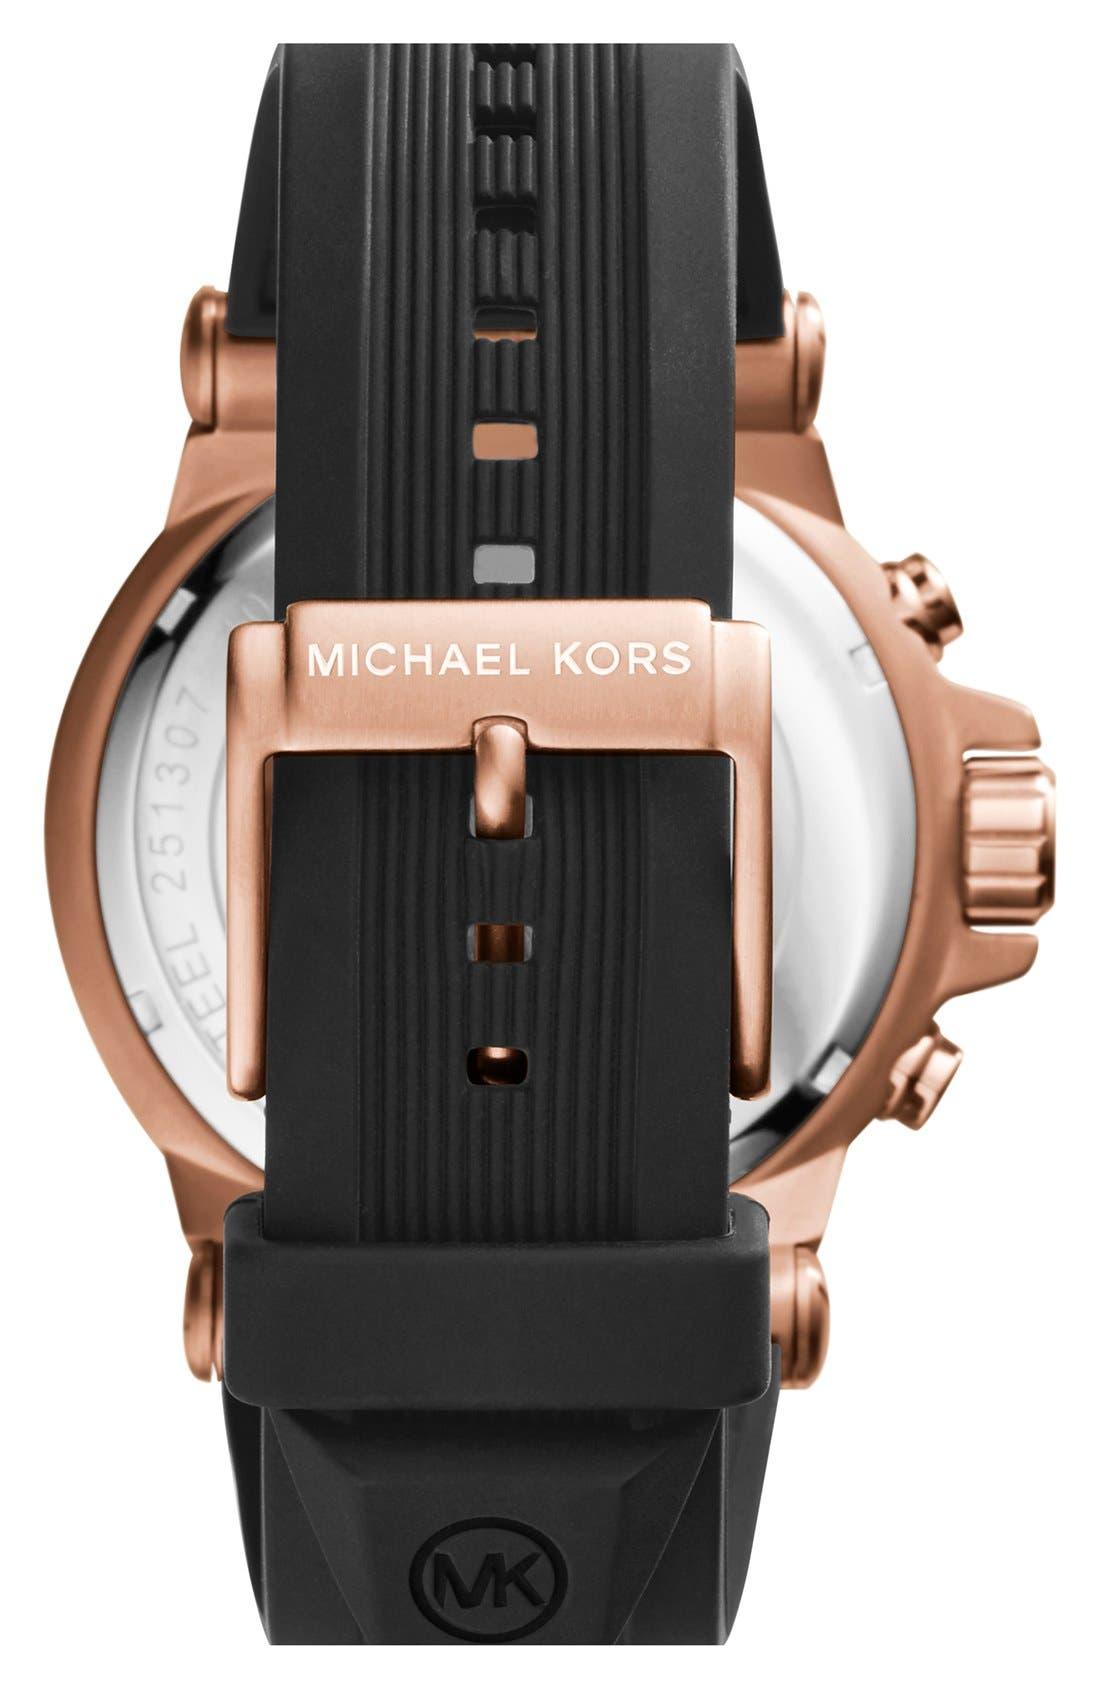 MICHAEL KORS, Chronograph Watch, 45mm, Alternate thumbnail 2, color, ROSE GOLD/ BLACK